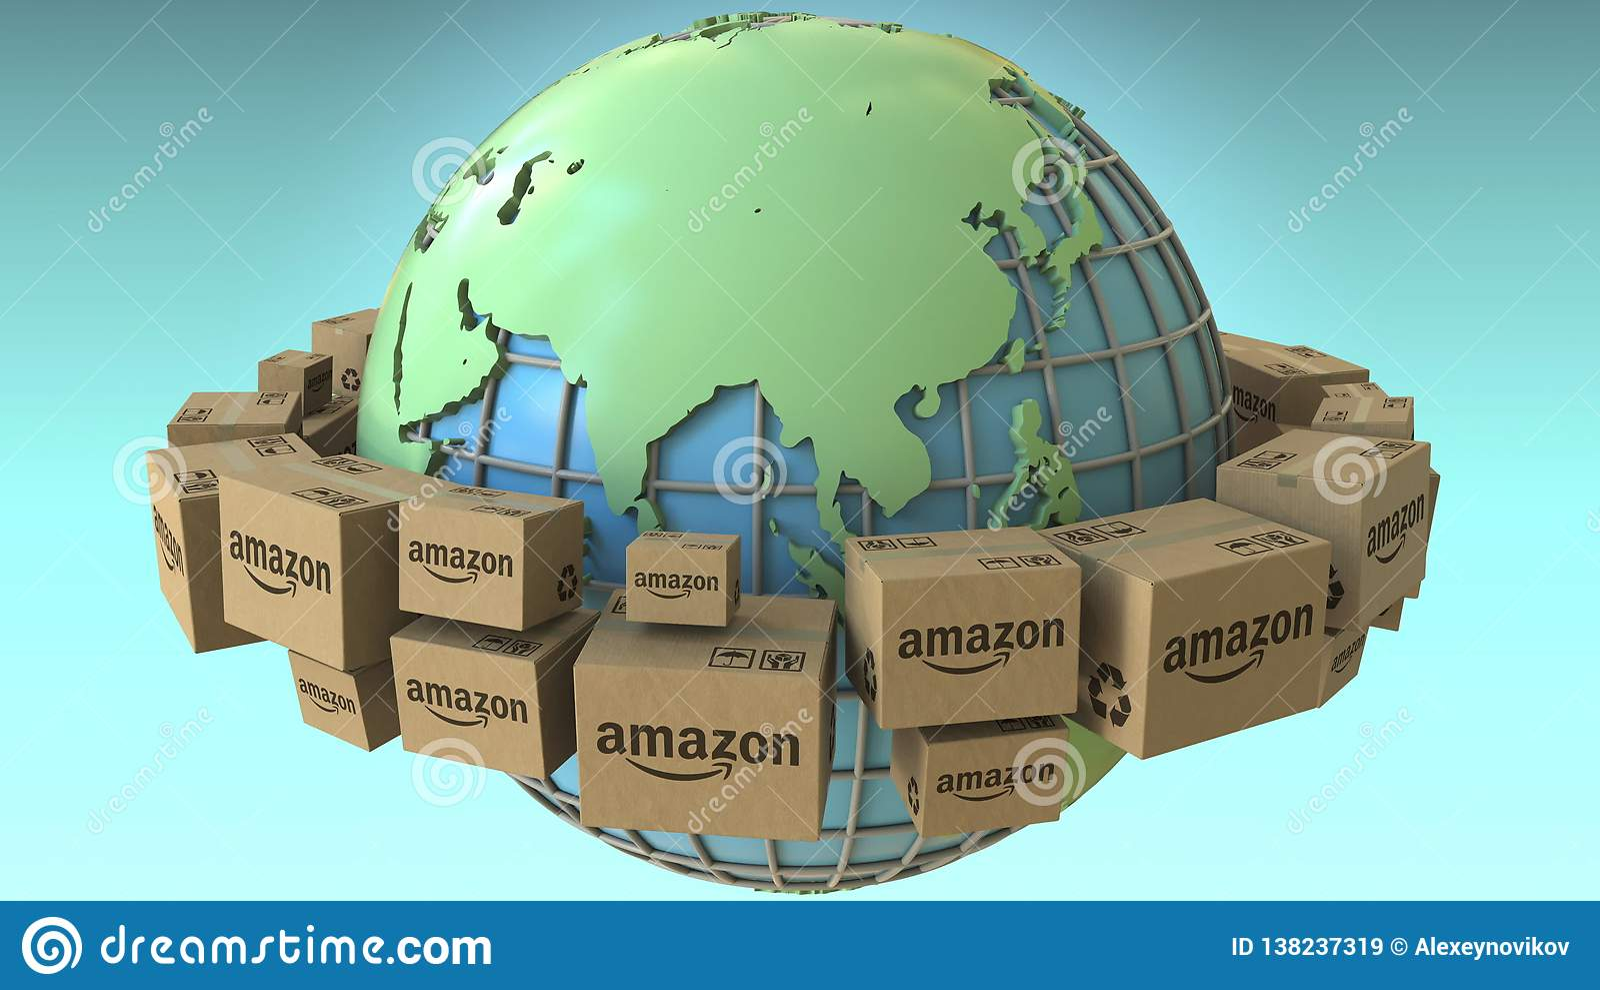 Many Cartons With AMAZON Logo Around The World, Asia Emphasized